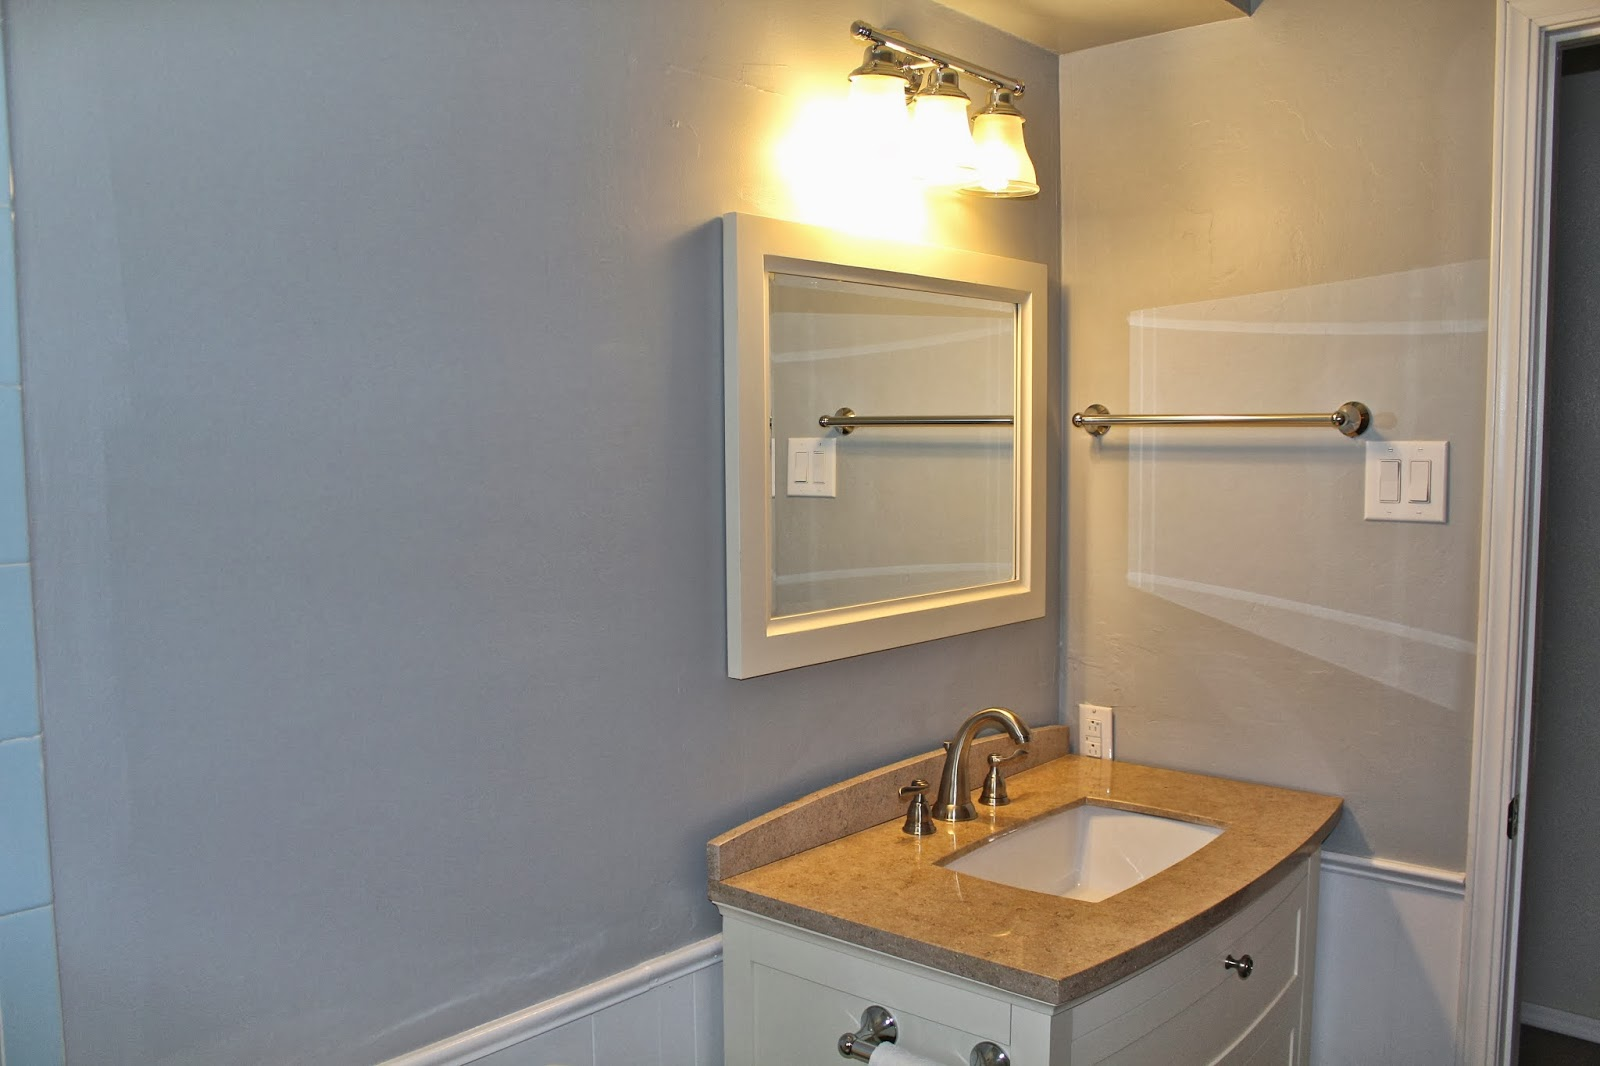 Bedrooms and hall bathroom tour emma marie designs for Hall bathroom ideas